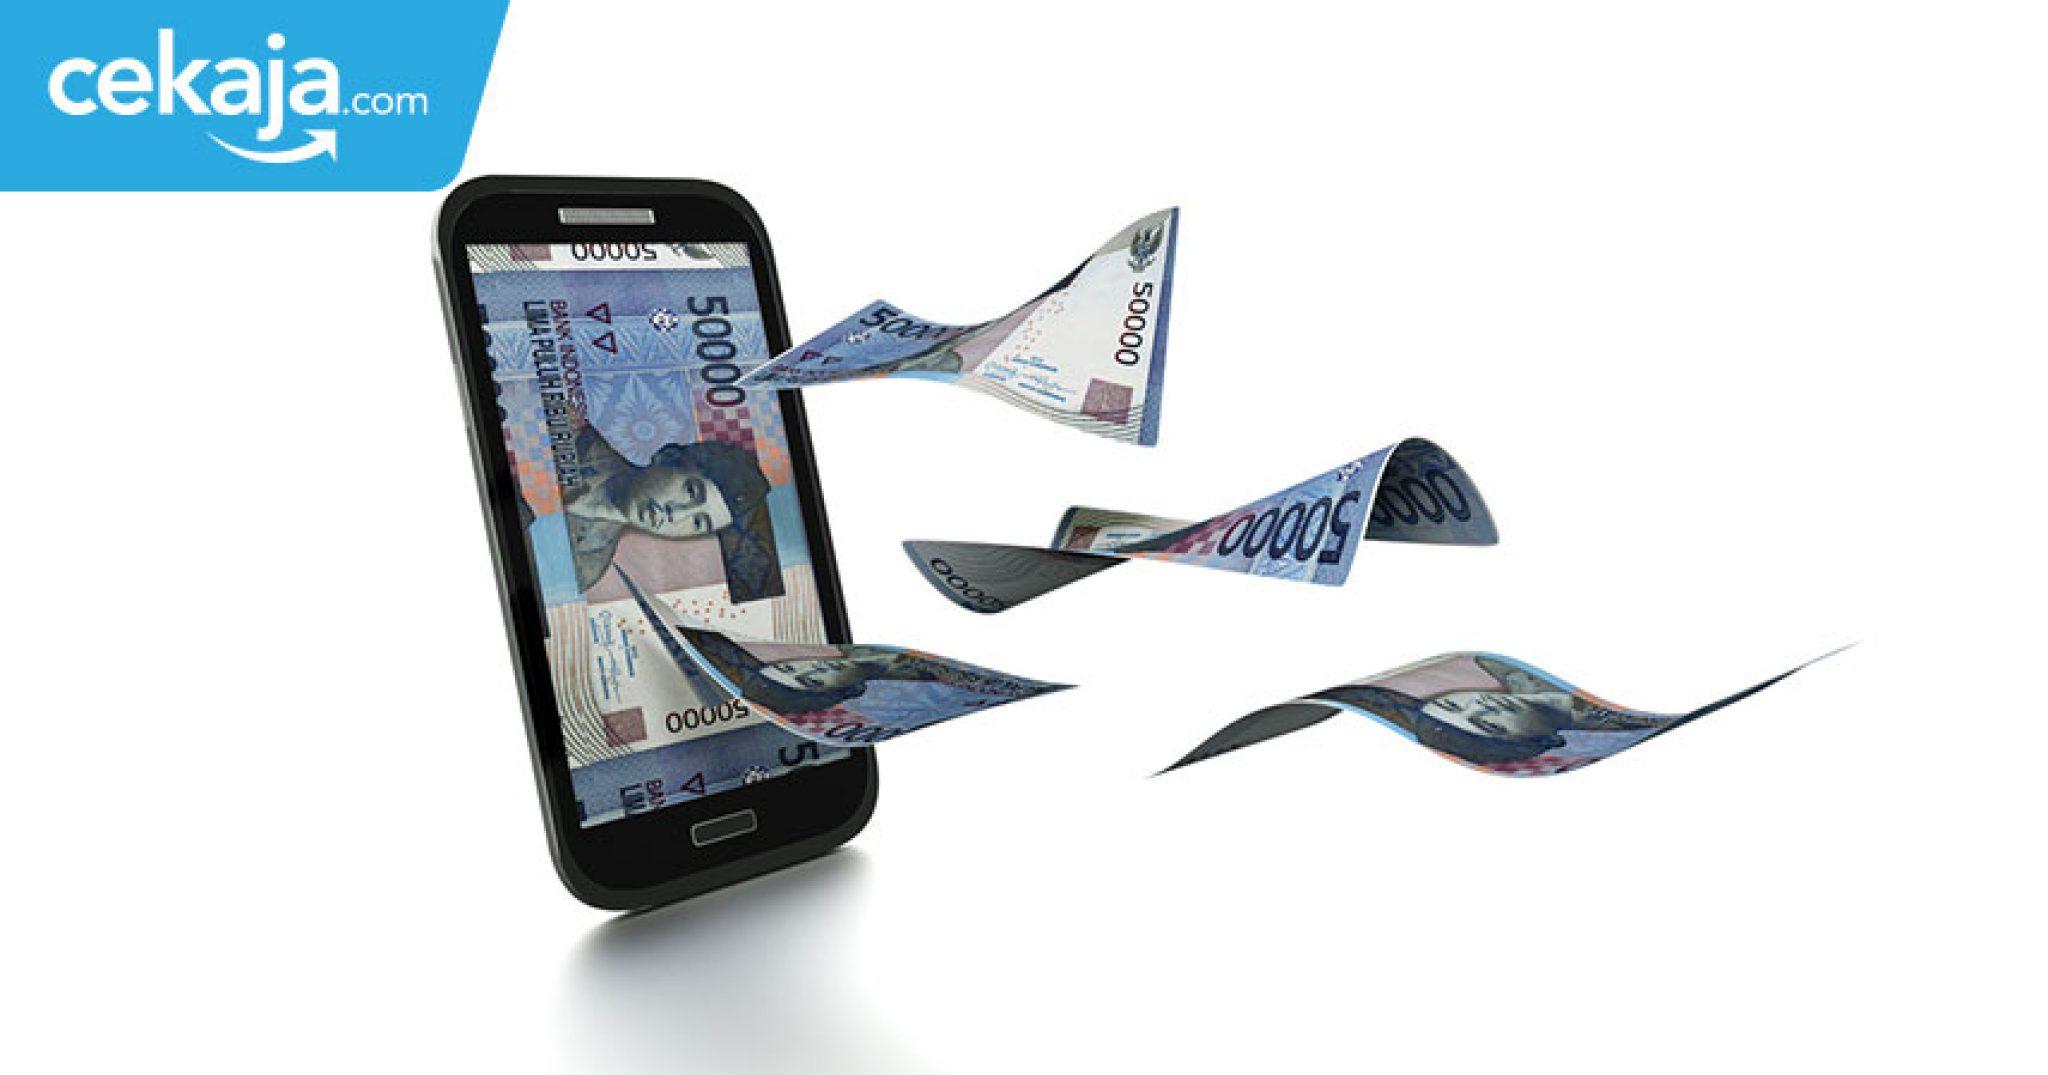 uang elektronik - CekAja.com